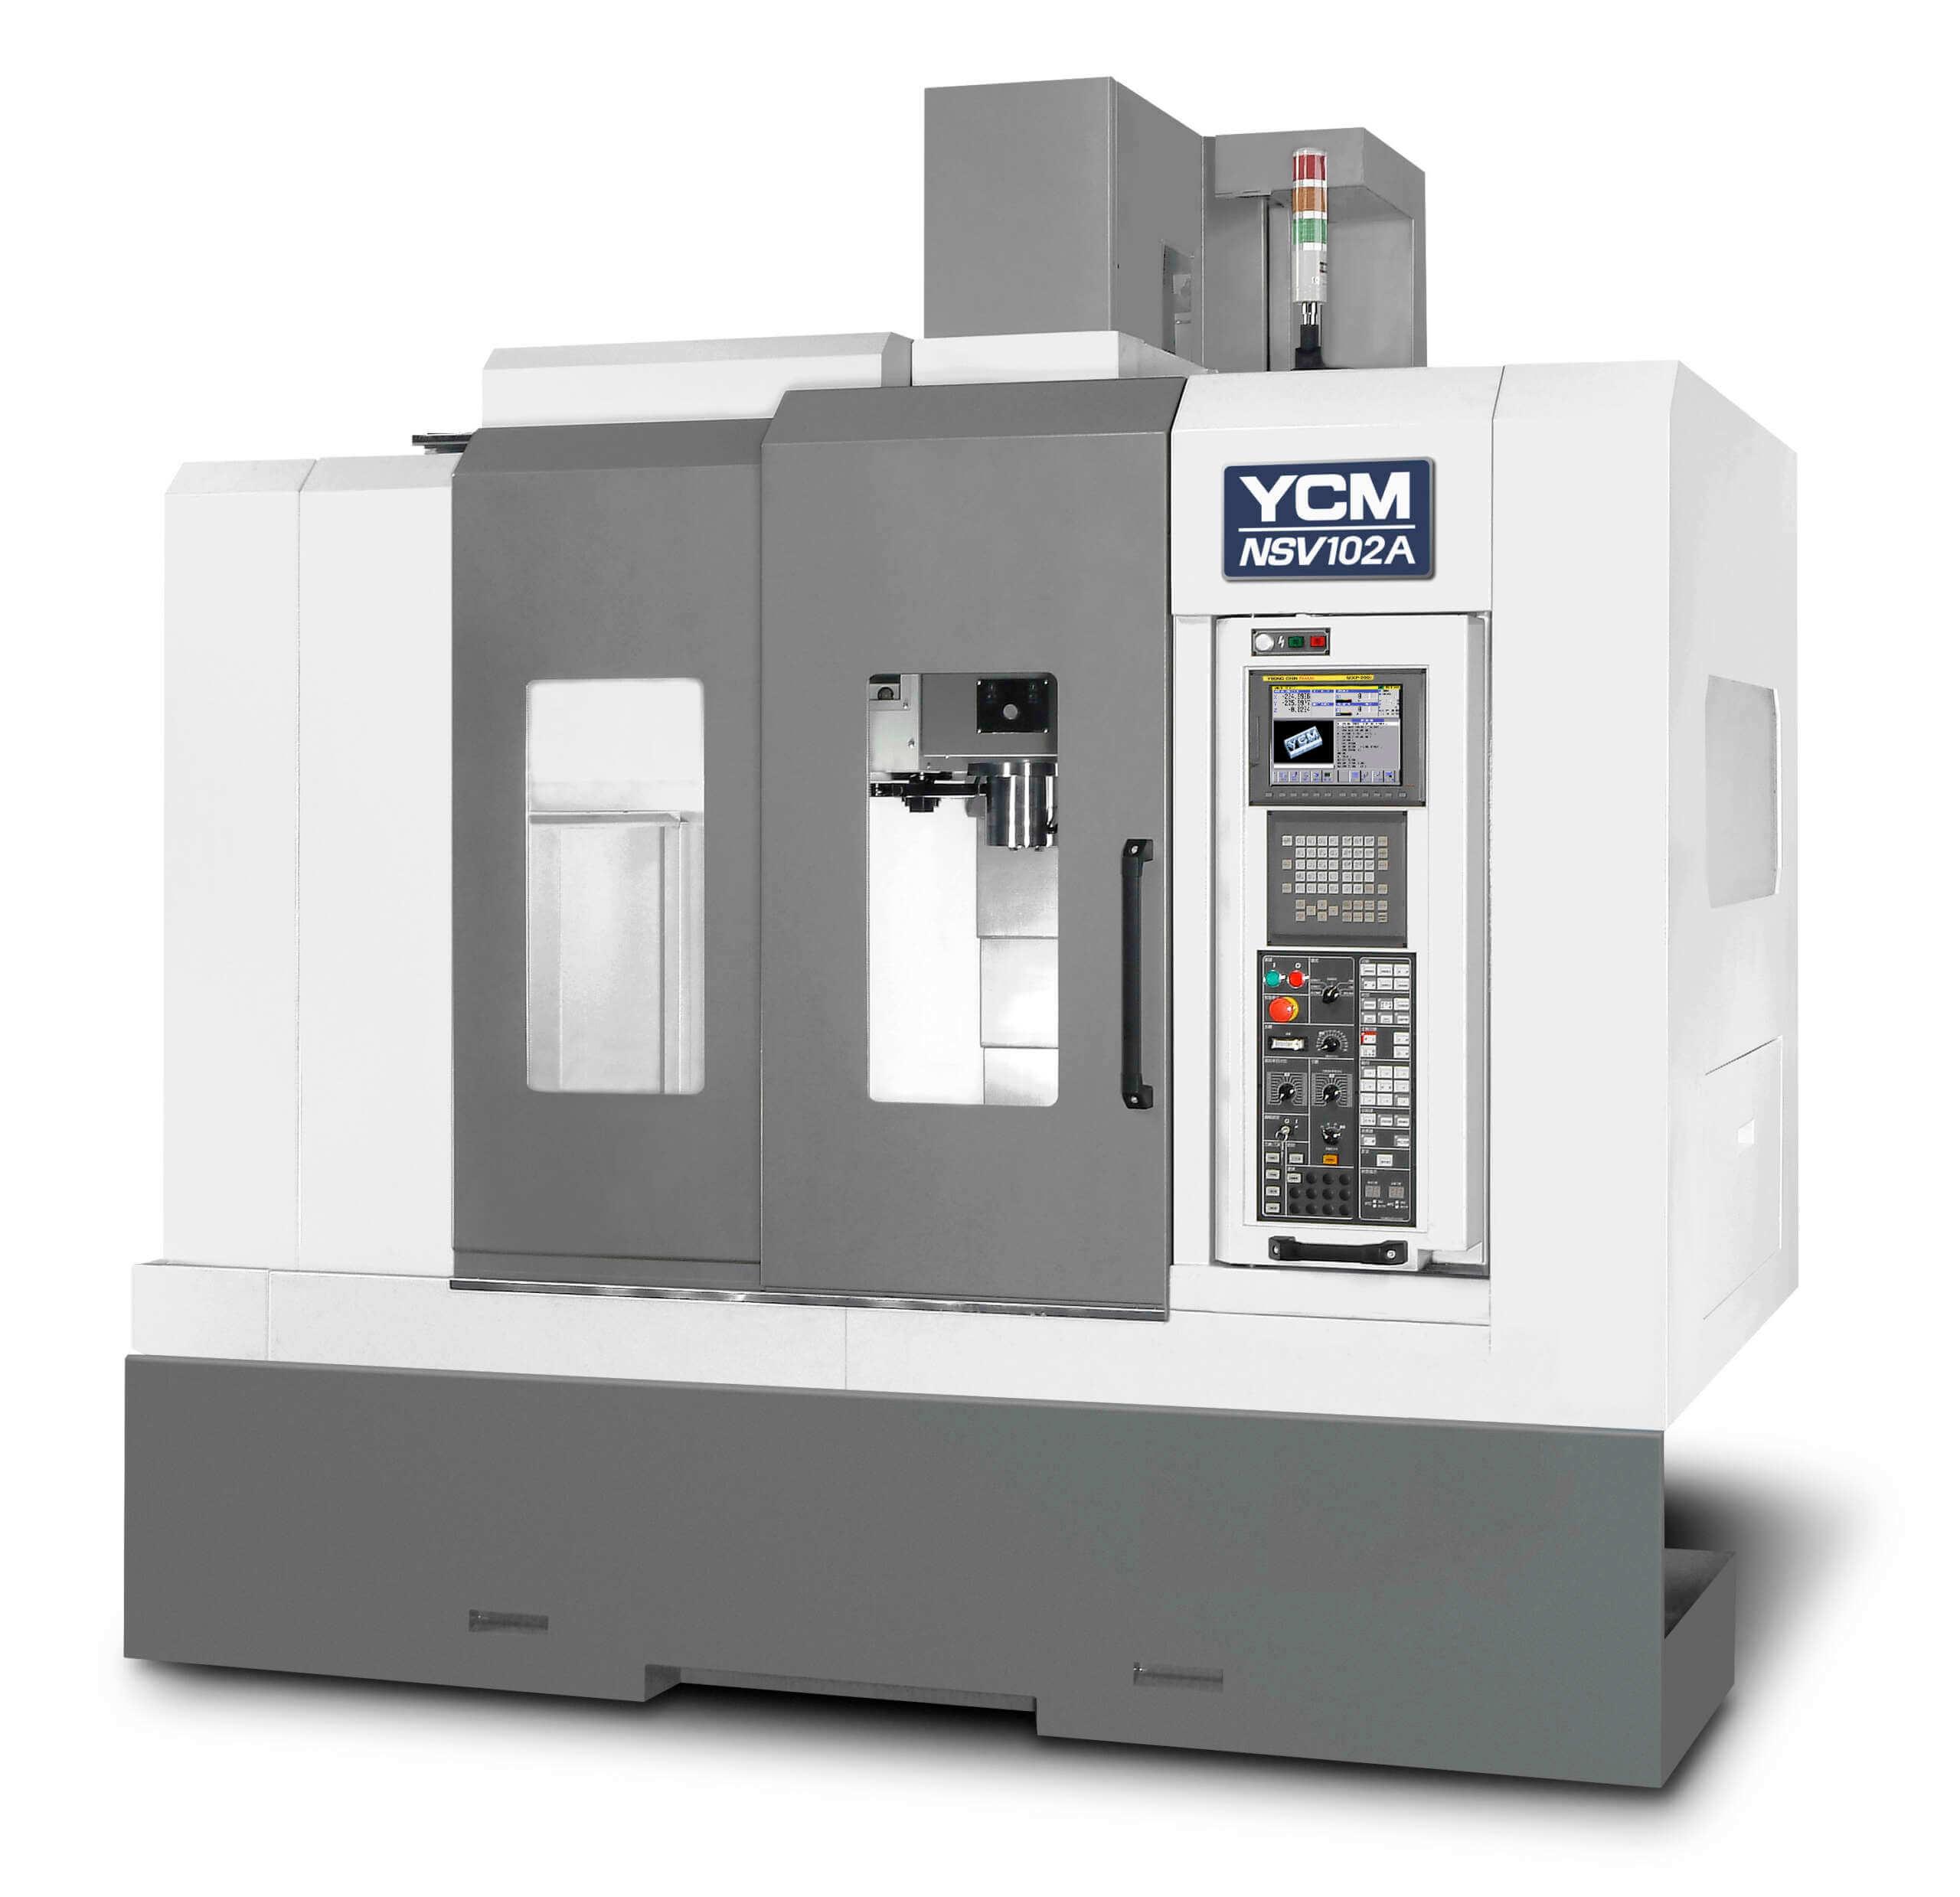 YCM NSV 102AH – 3 machines